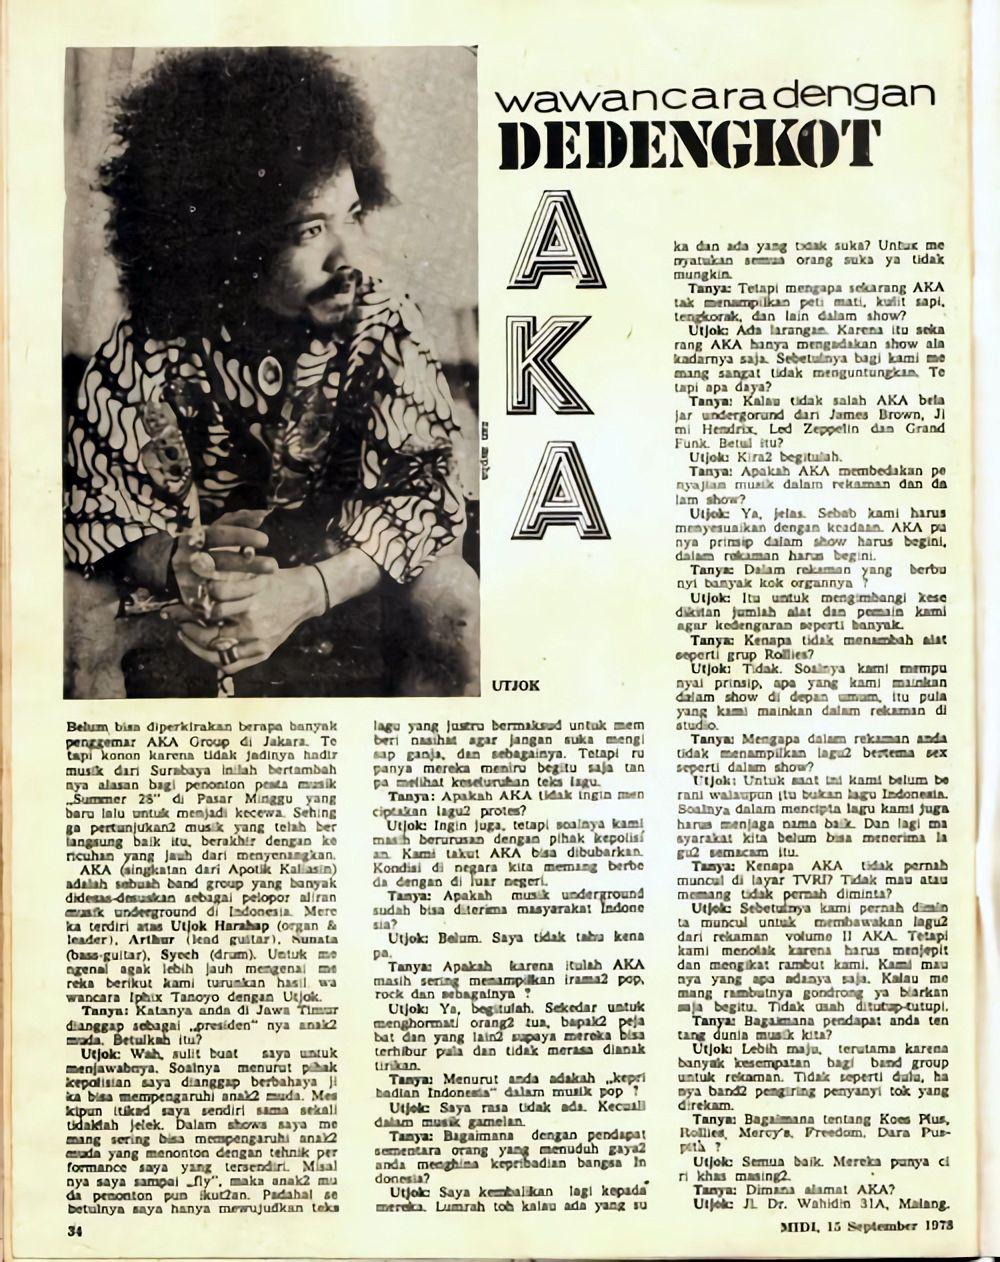 Majalah MIDI edisi 1973 Wawancara, Majalah, Berita